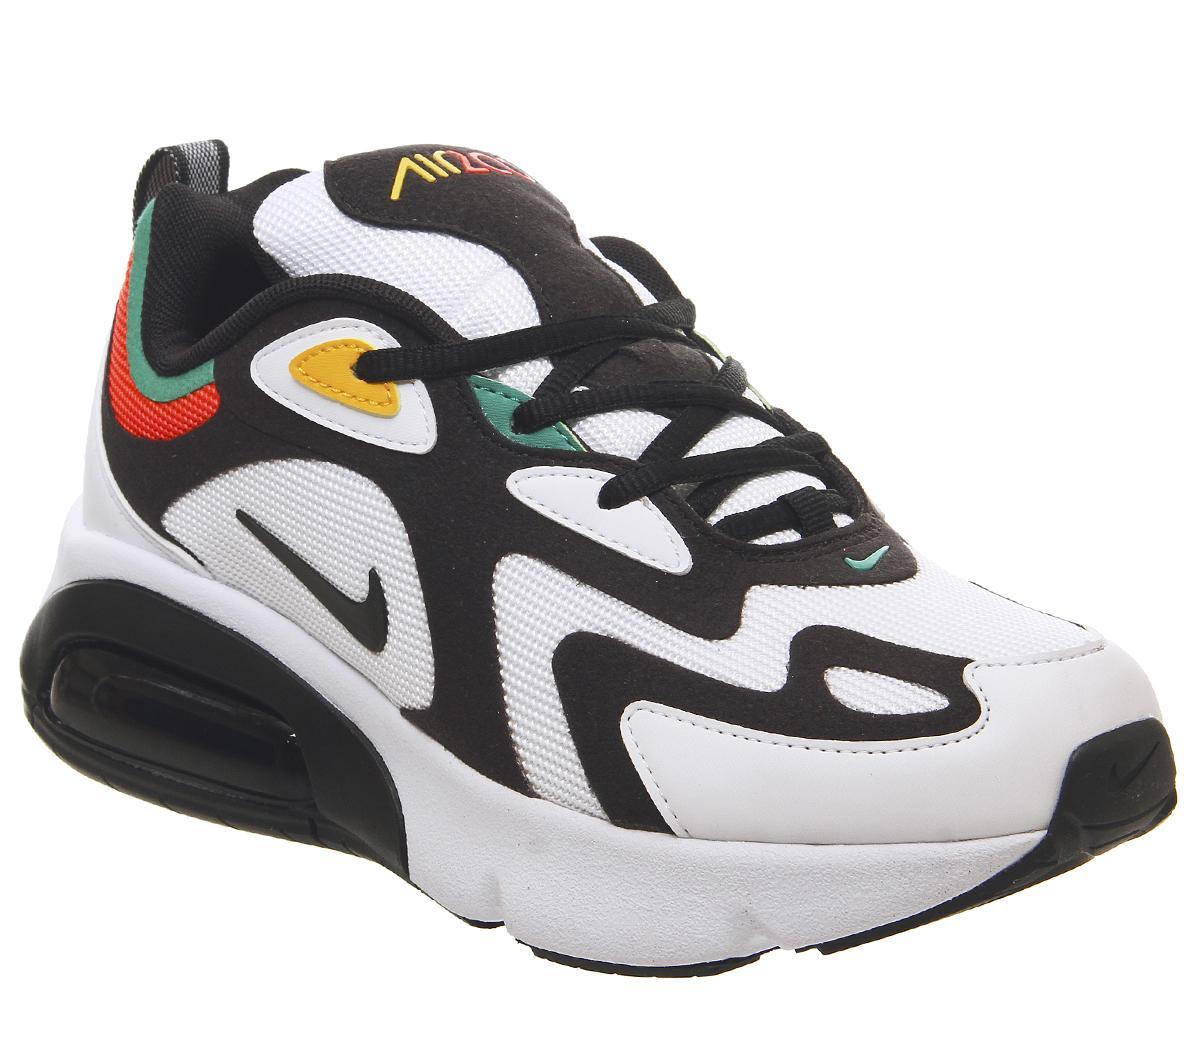 Nike Air Max 200 Gs Trainers Black